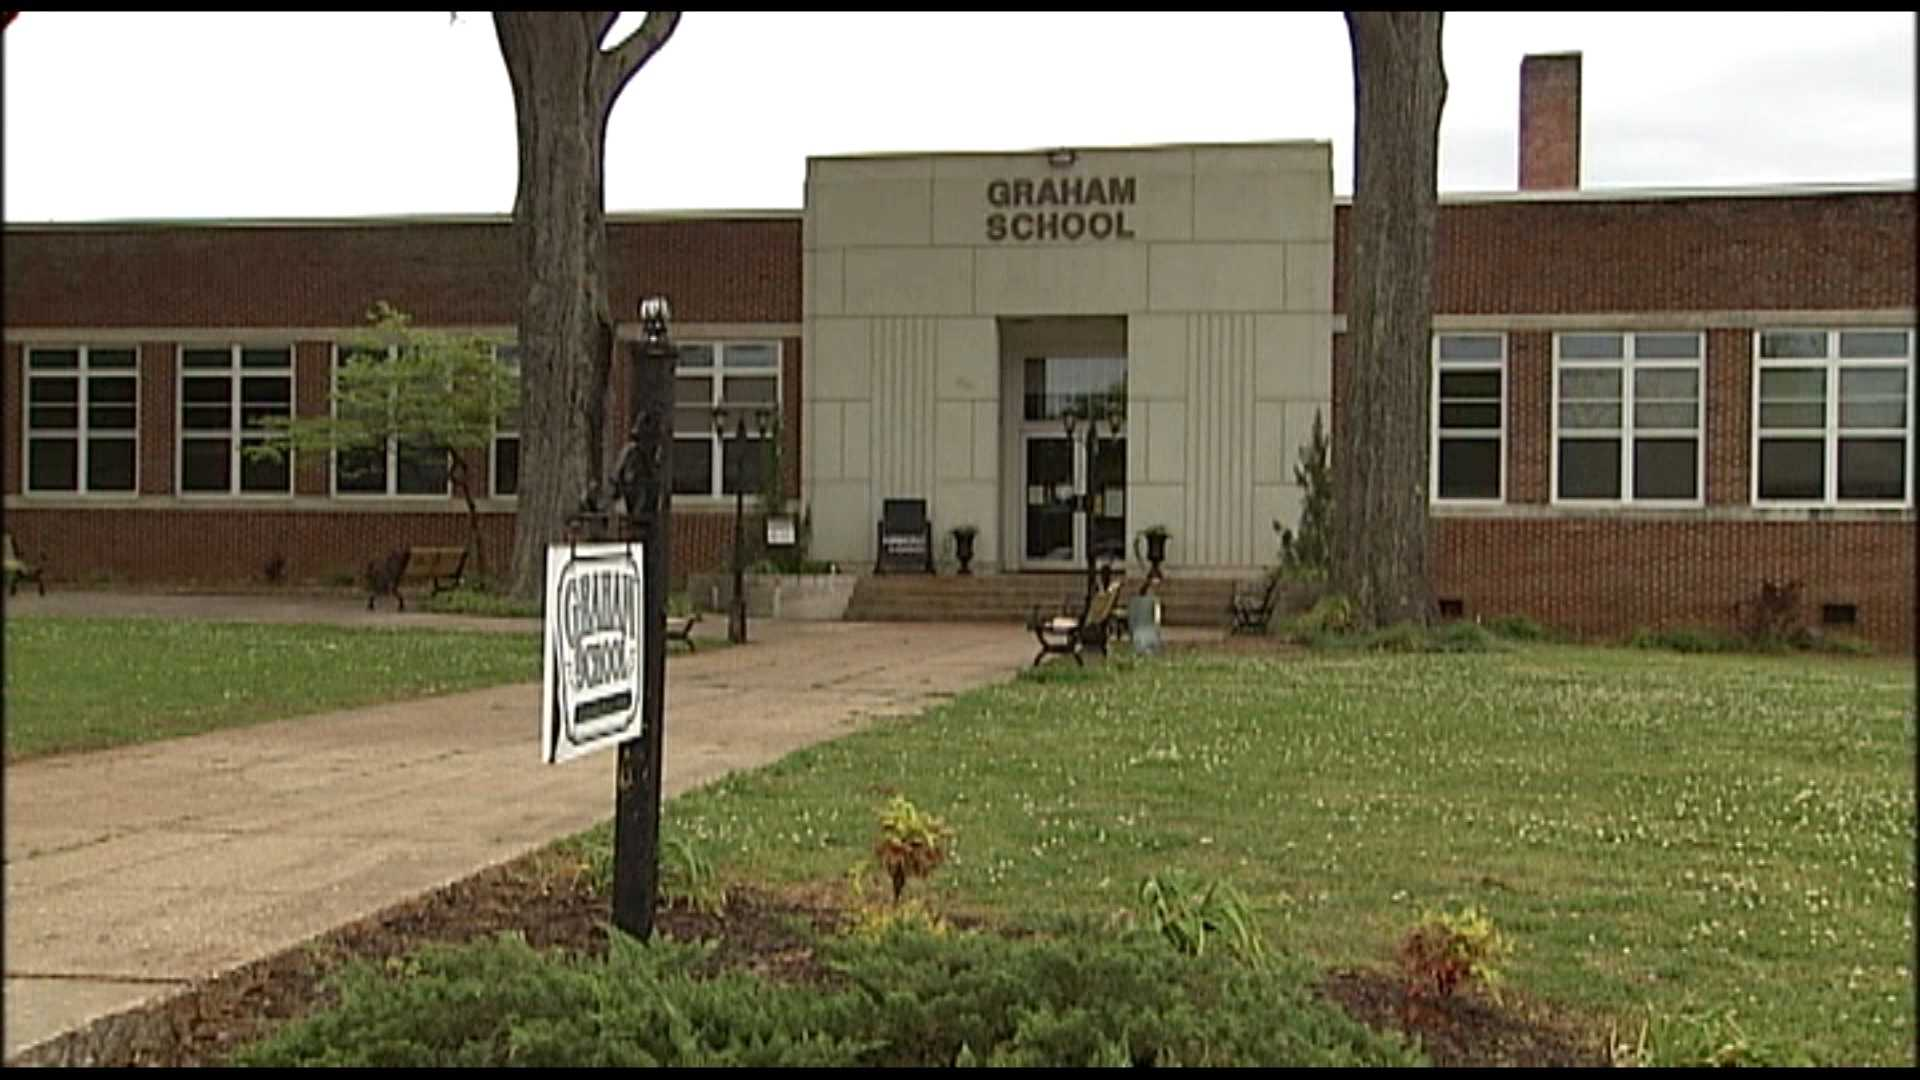 Graham Elementary School Talladega.jpg